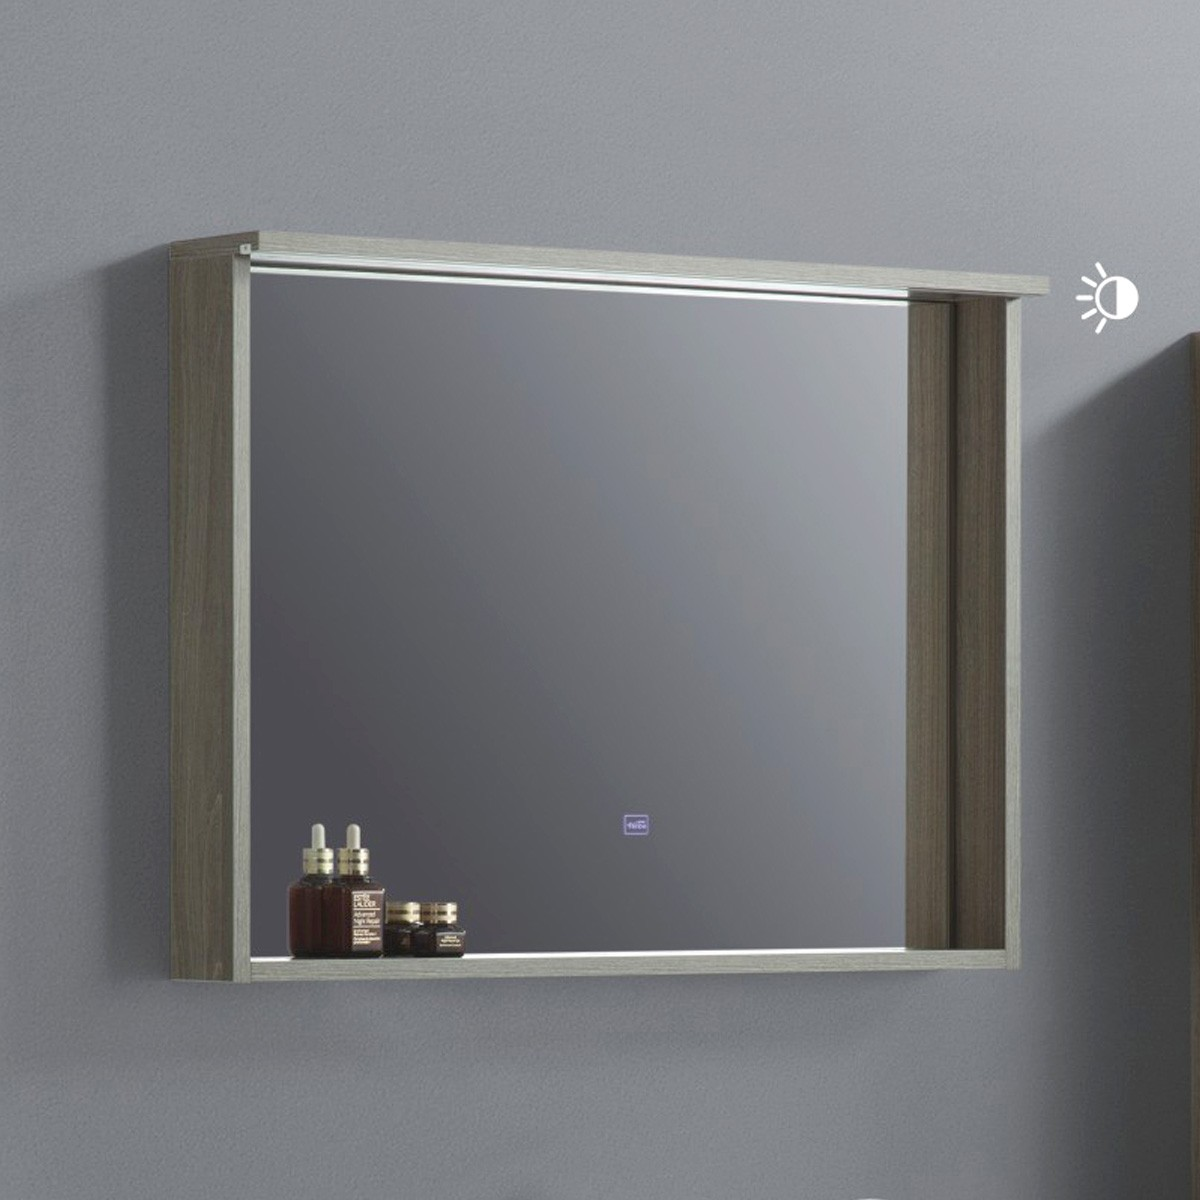 32 x 24 In. Bathroom Vanity LED Mirror with Shelf (VSW8002-M)